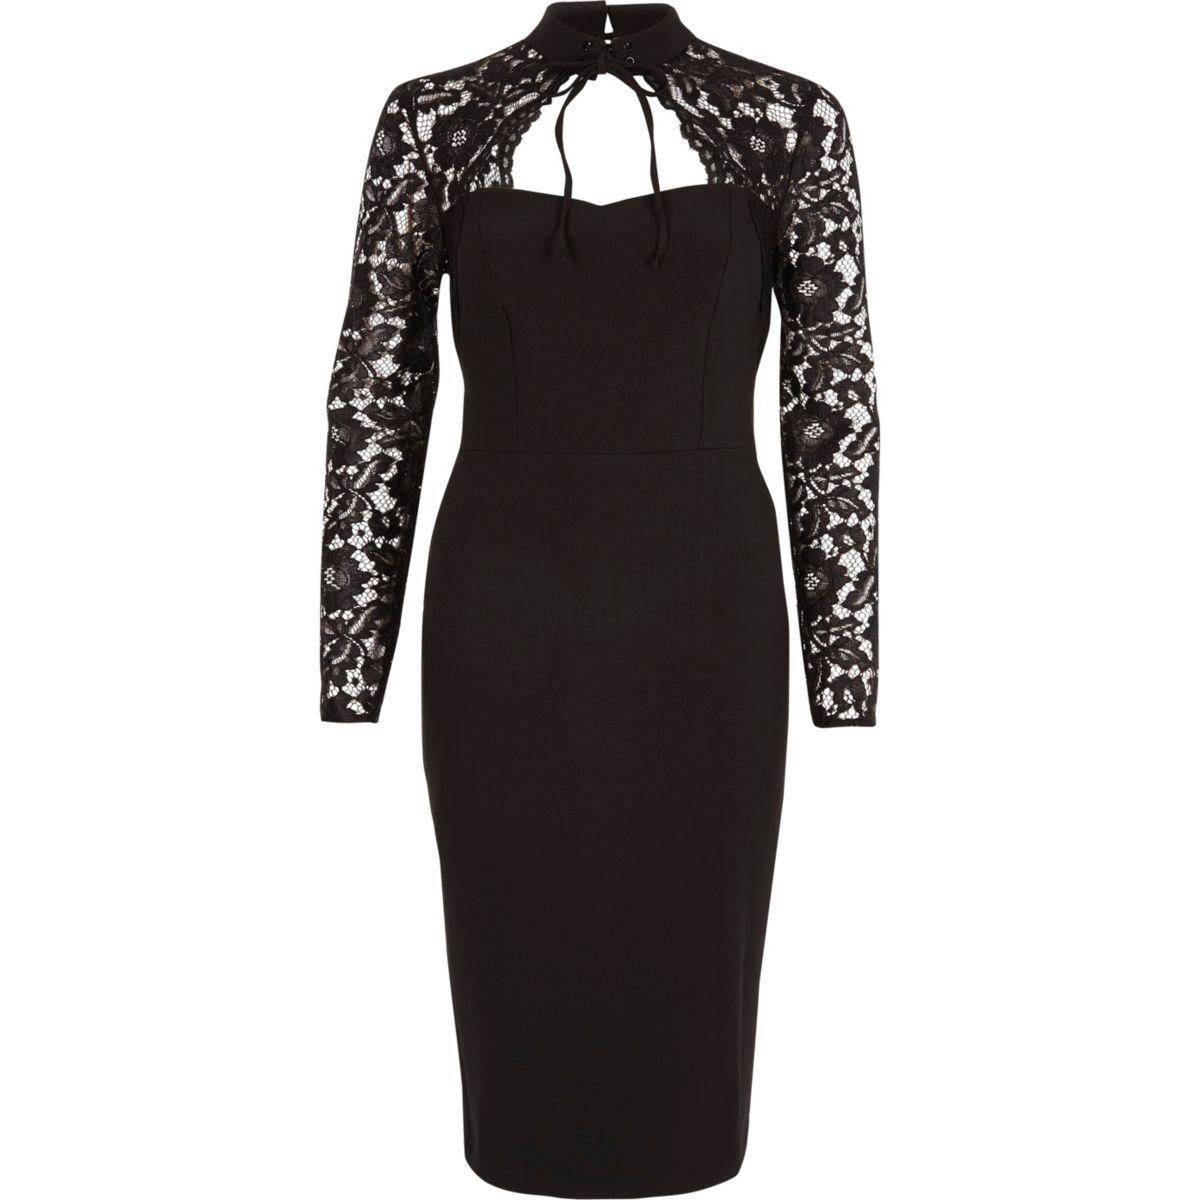 Black lace sleeve choker neck bodycon dress